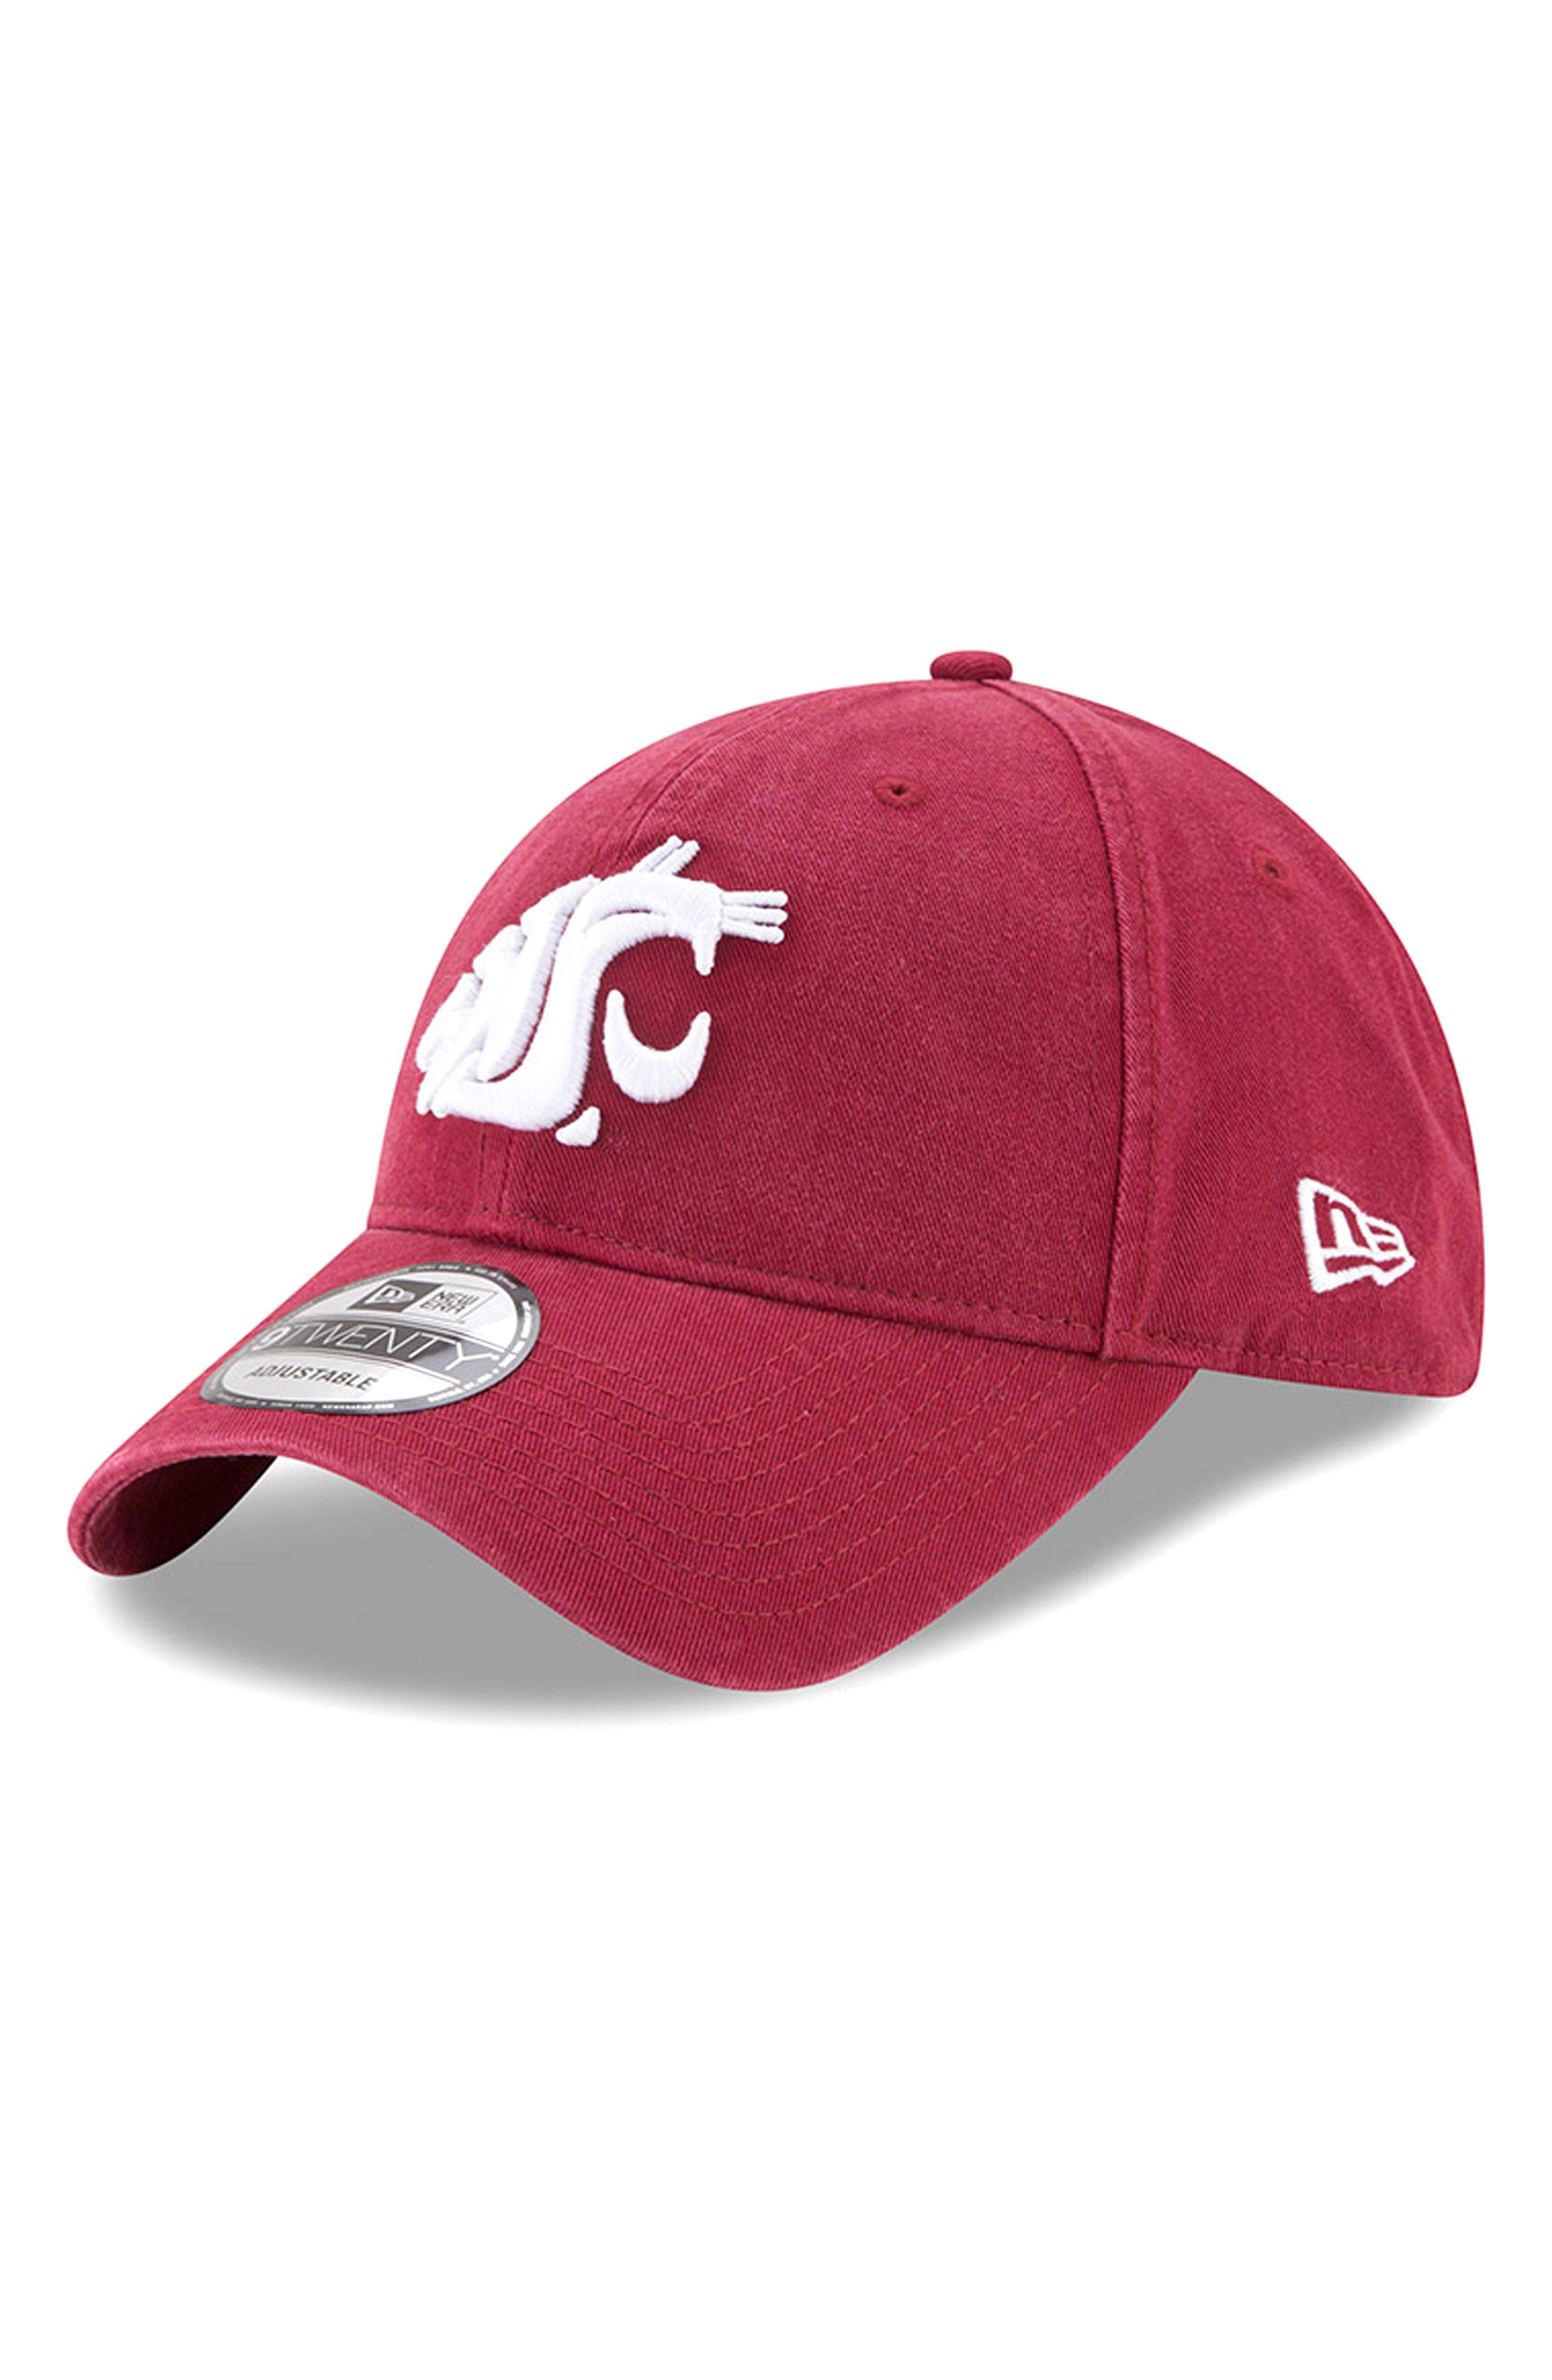 New Era Collegiate Core Classic - Washington State Cougars Baseball Cap